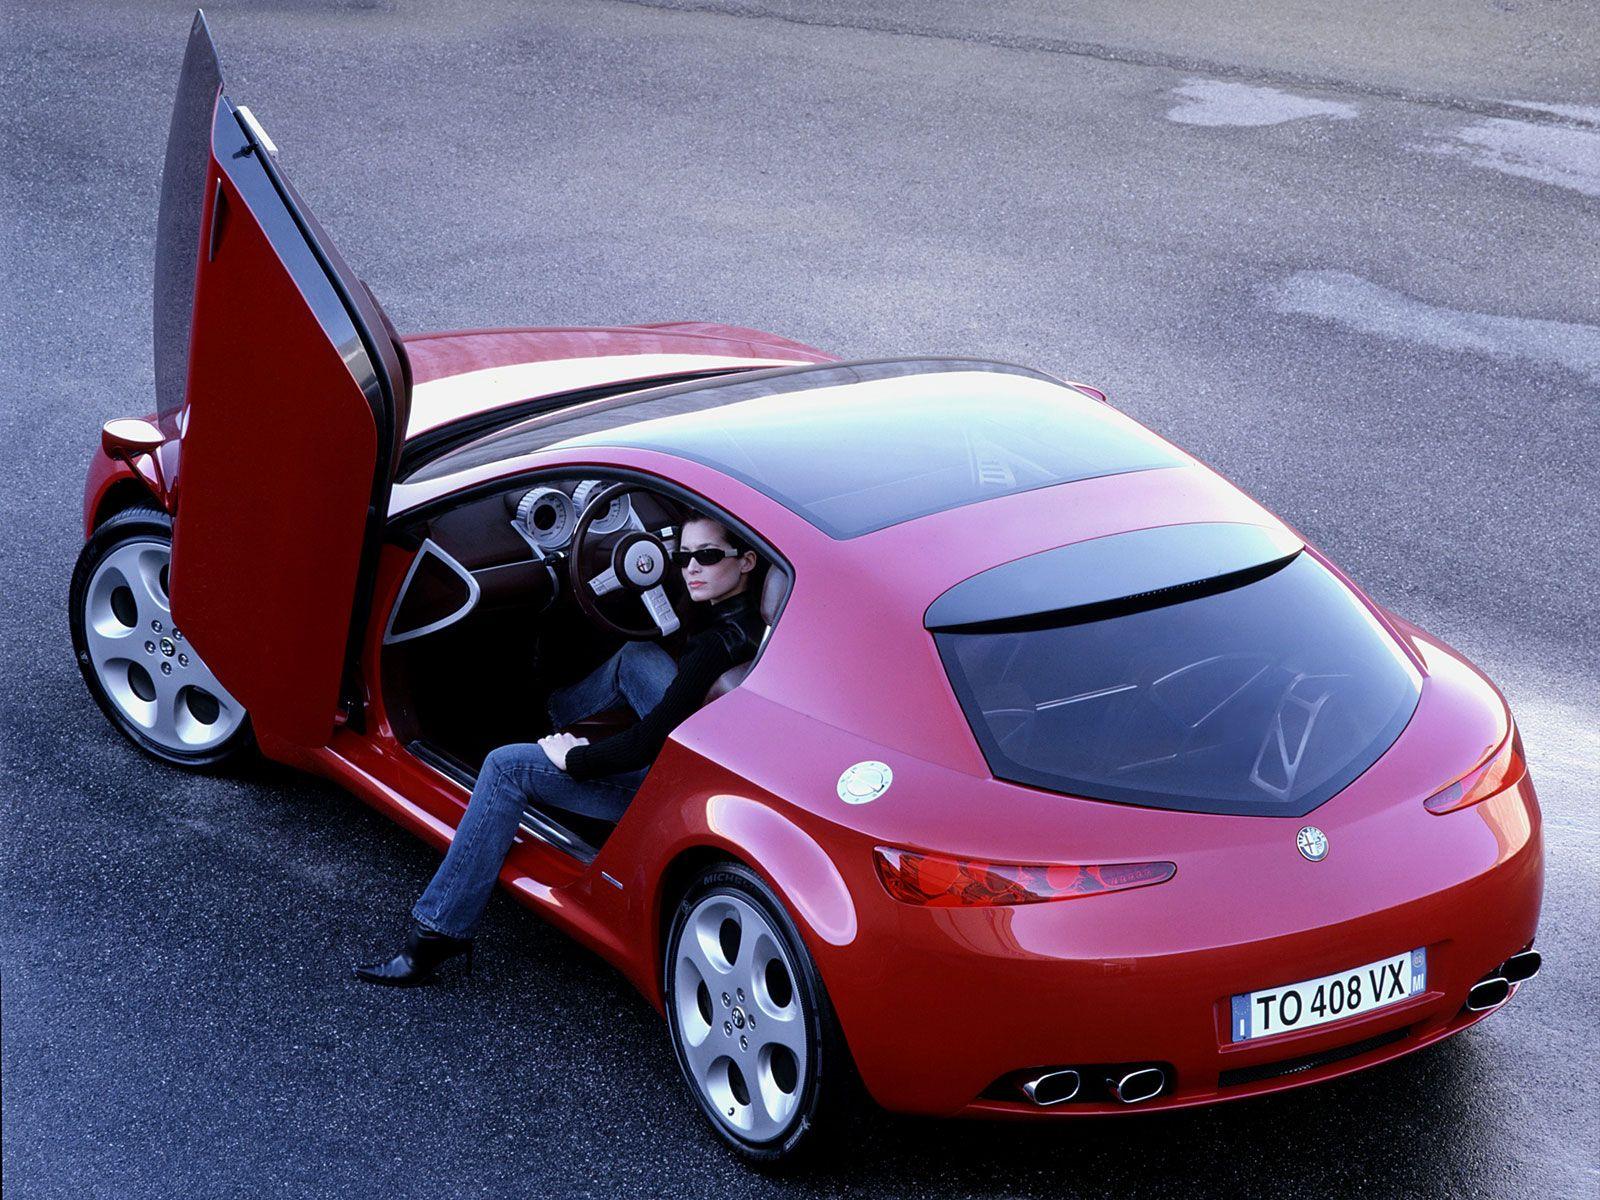 Les concepts ItalDesign Alfa Romeo Brera 2002